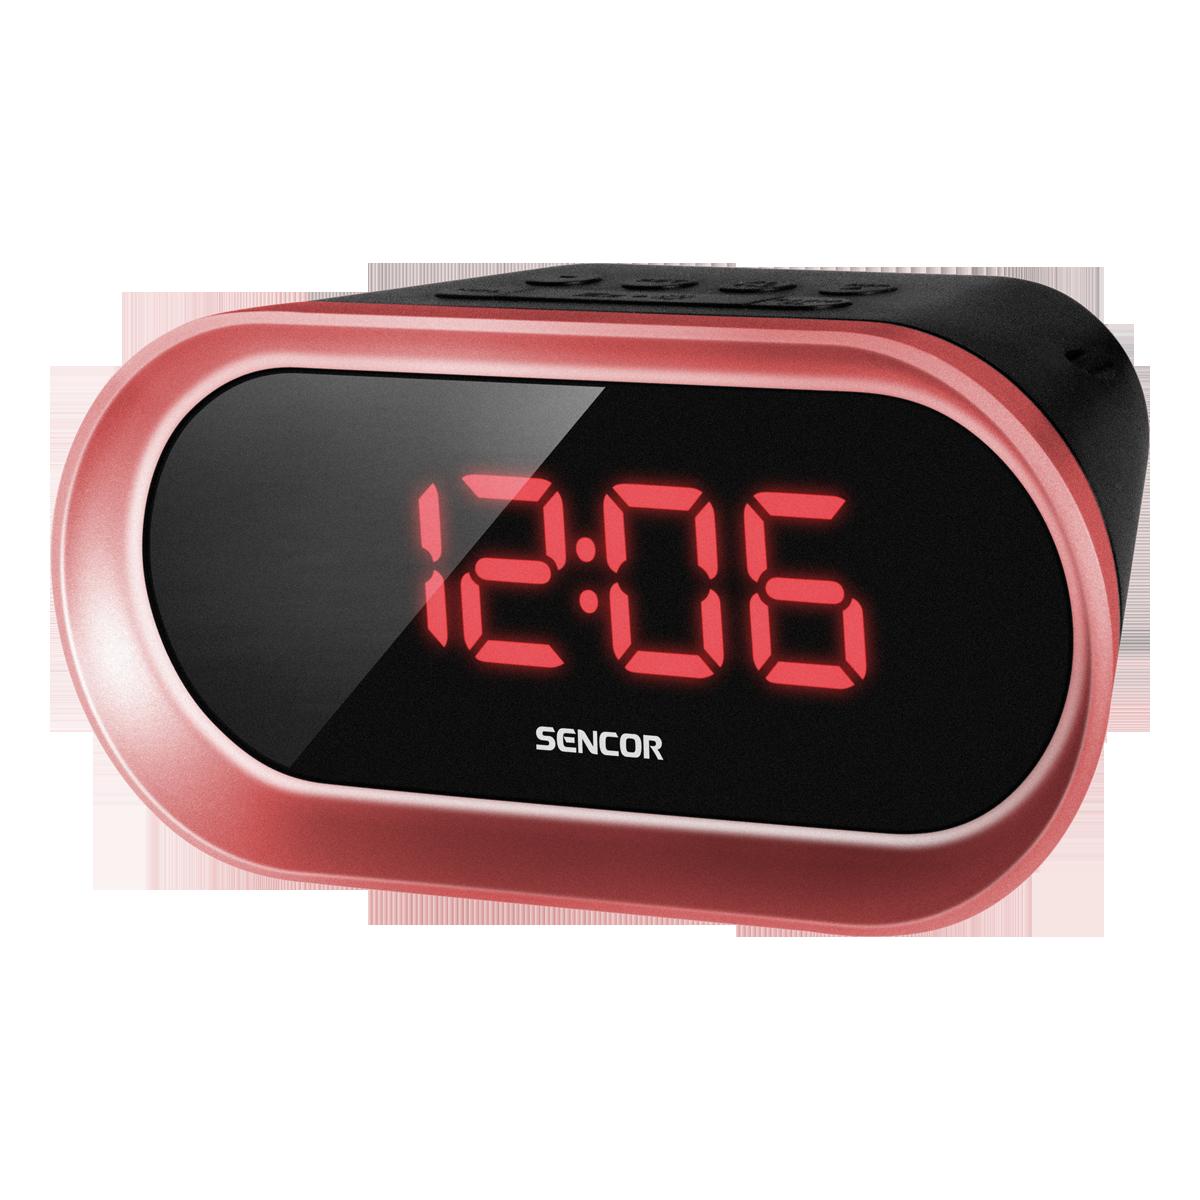 Radio Alarm Clock SENCOR SRC 150 R radio, radiopulksteņi